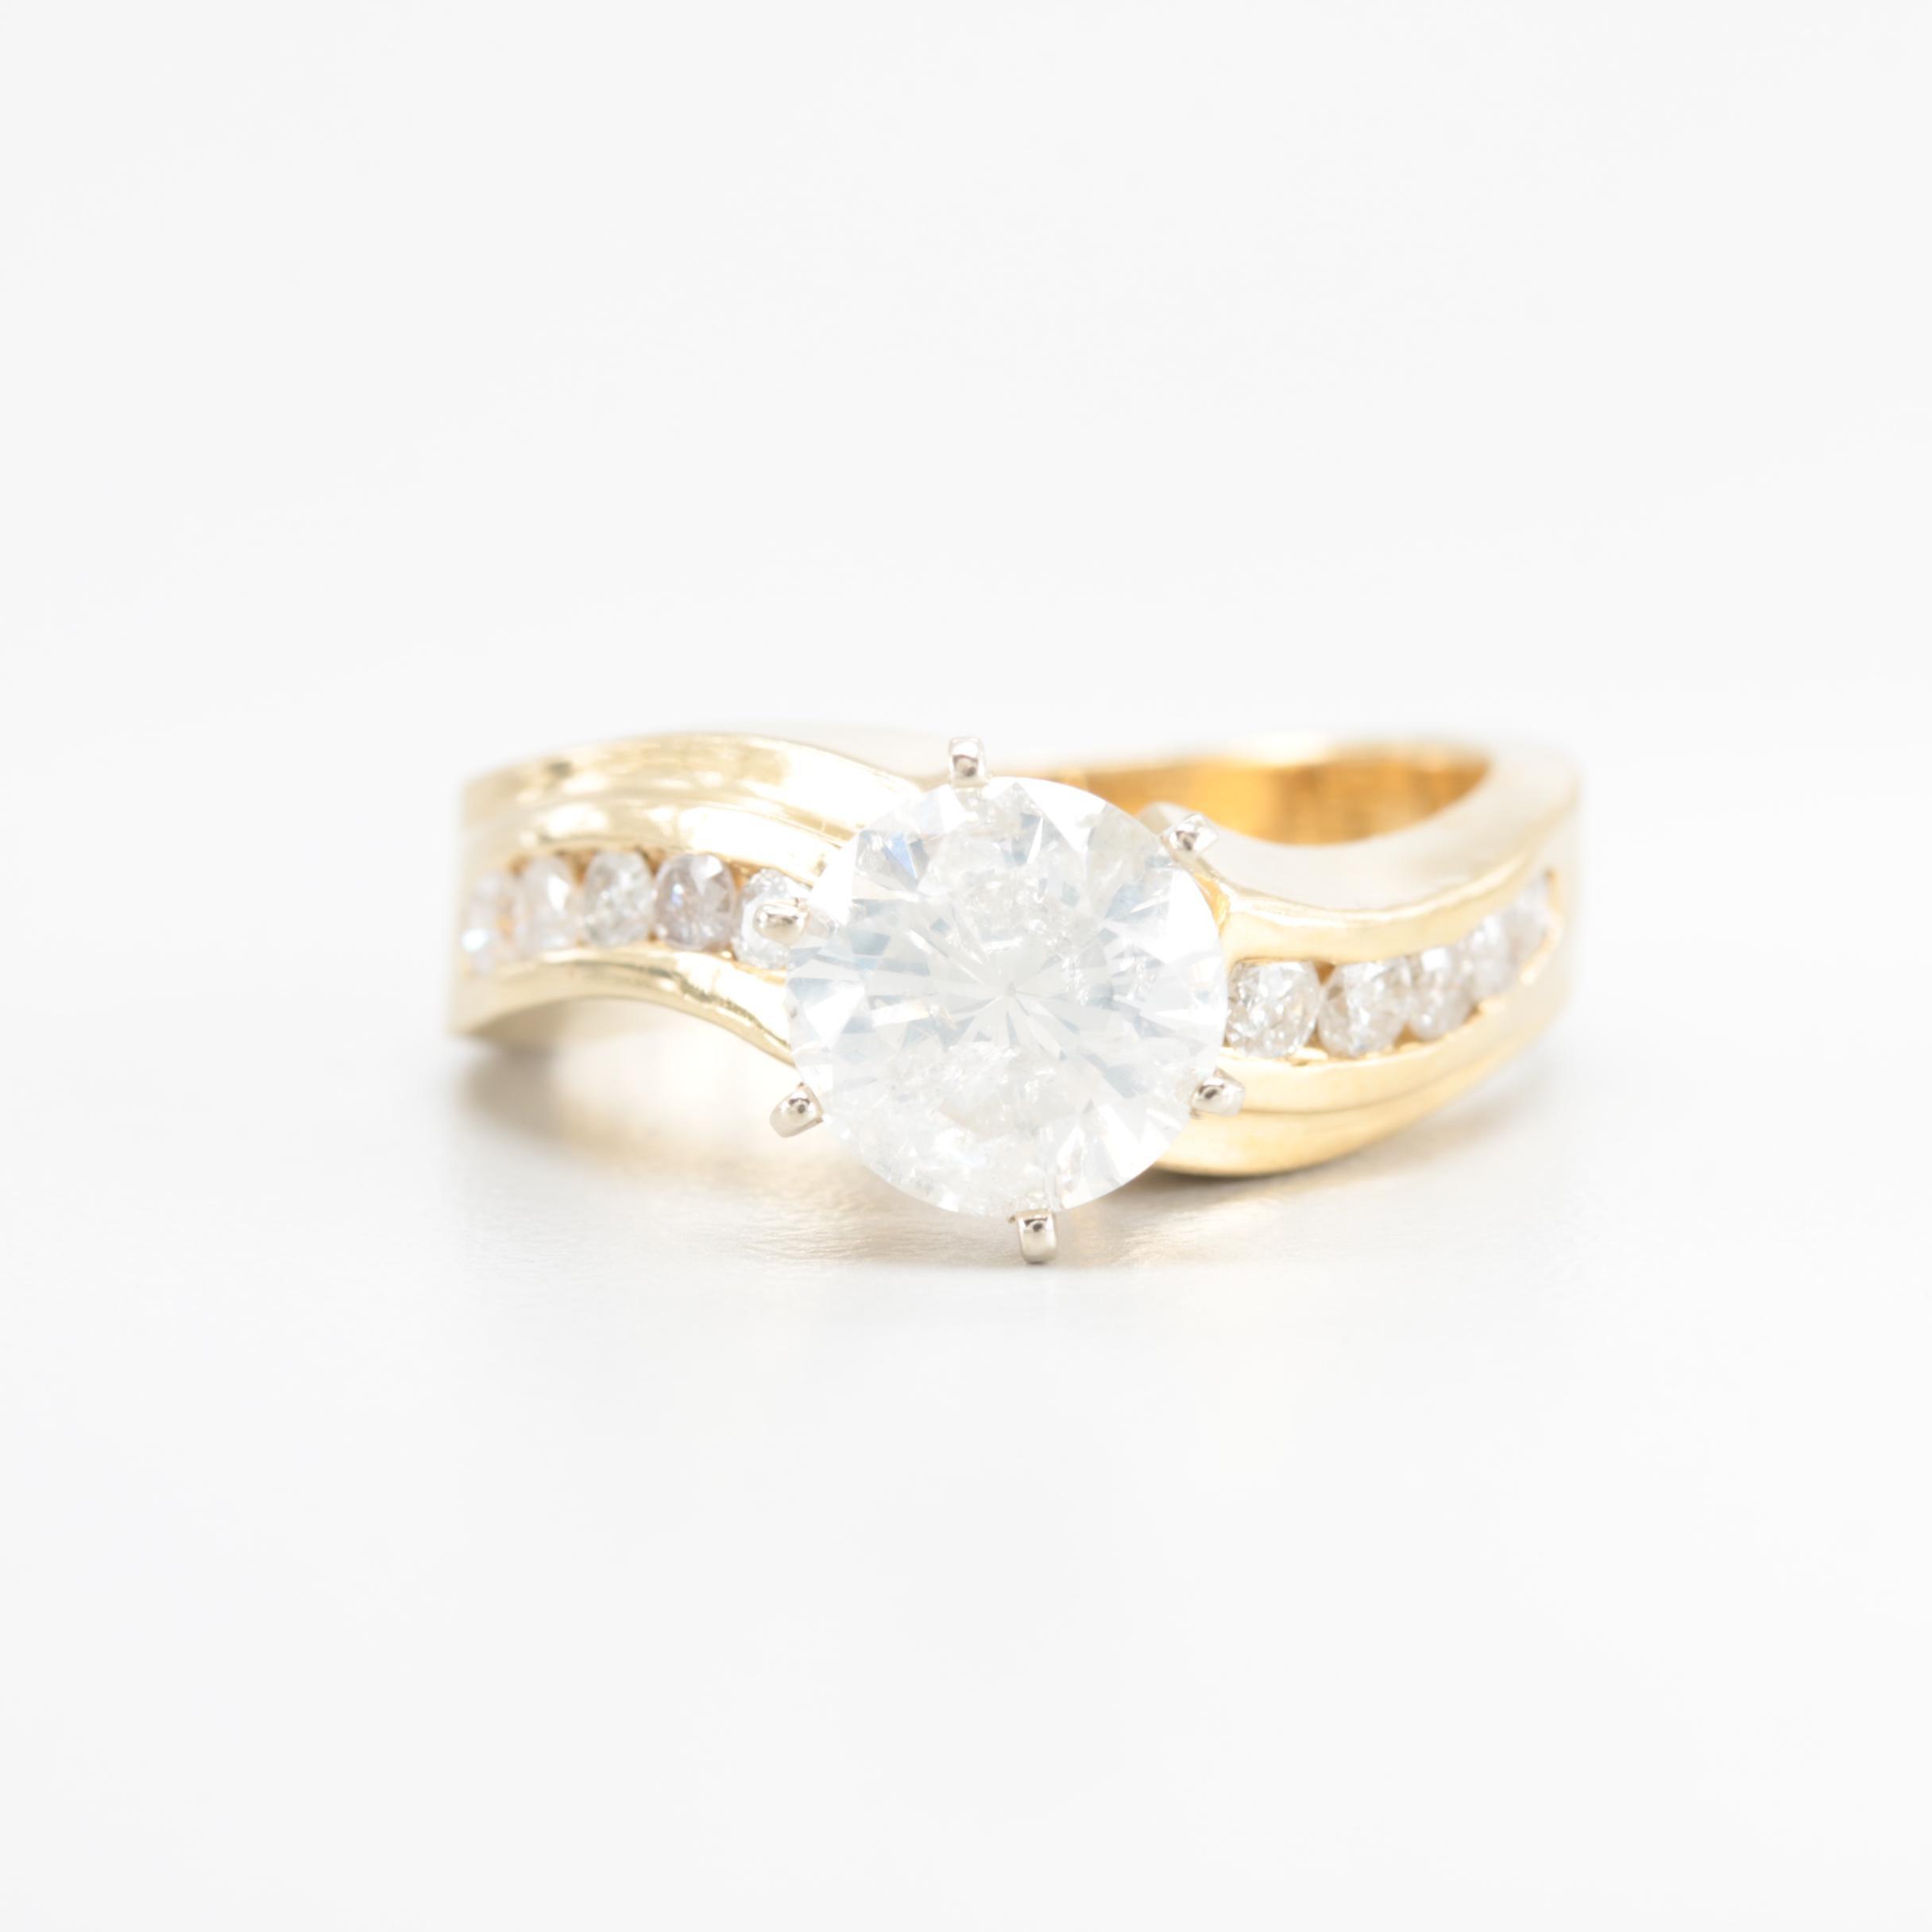 14K Yellow Gold 1.97 CTW Diamond Ring